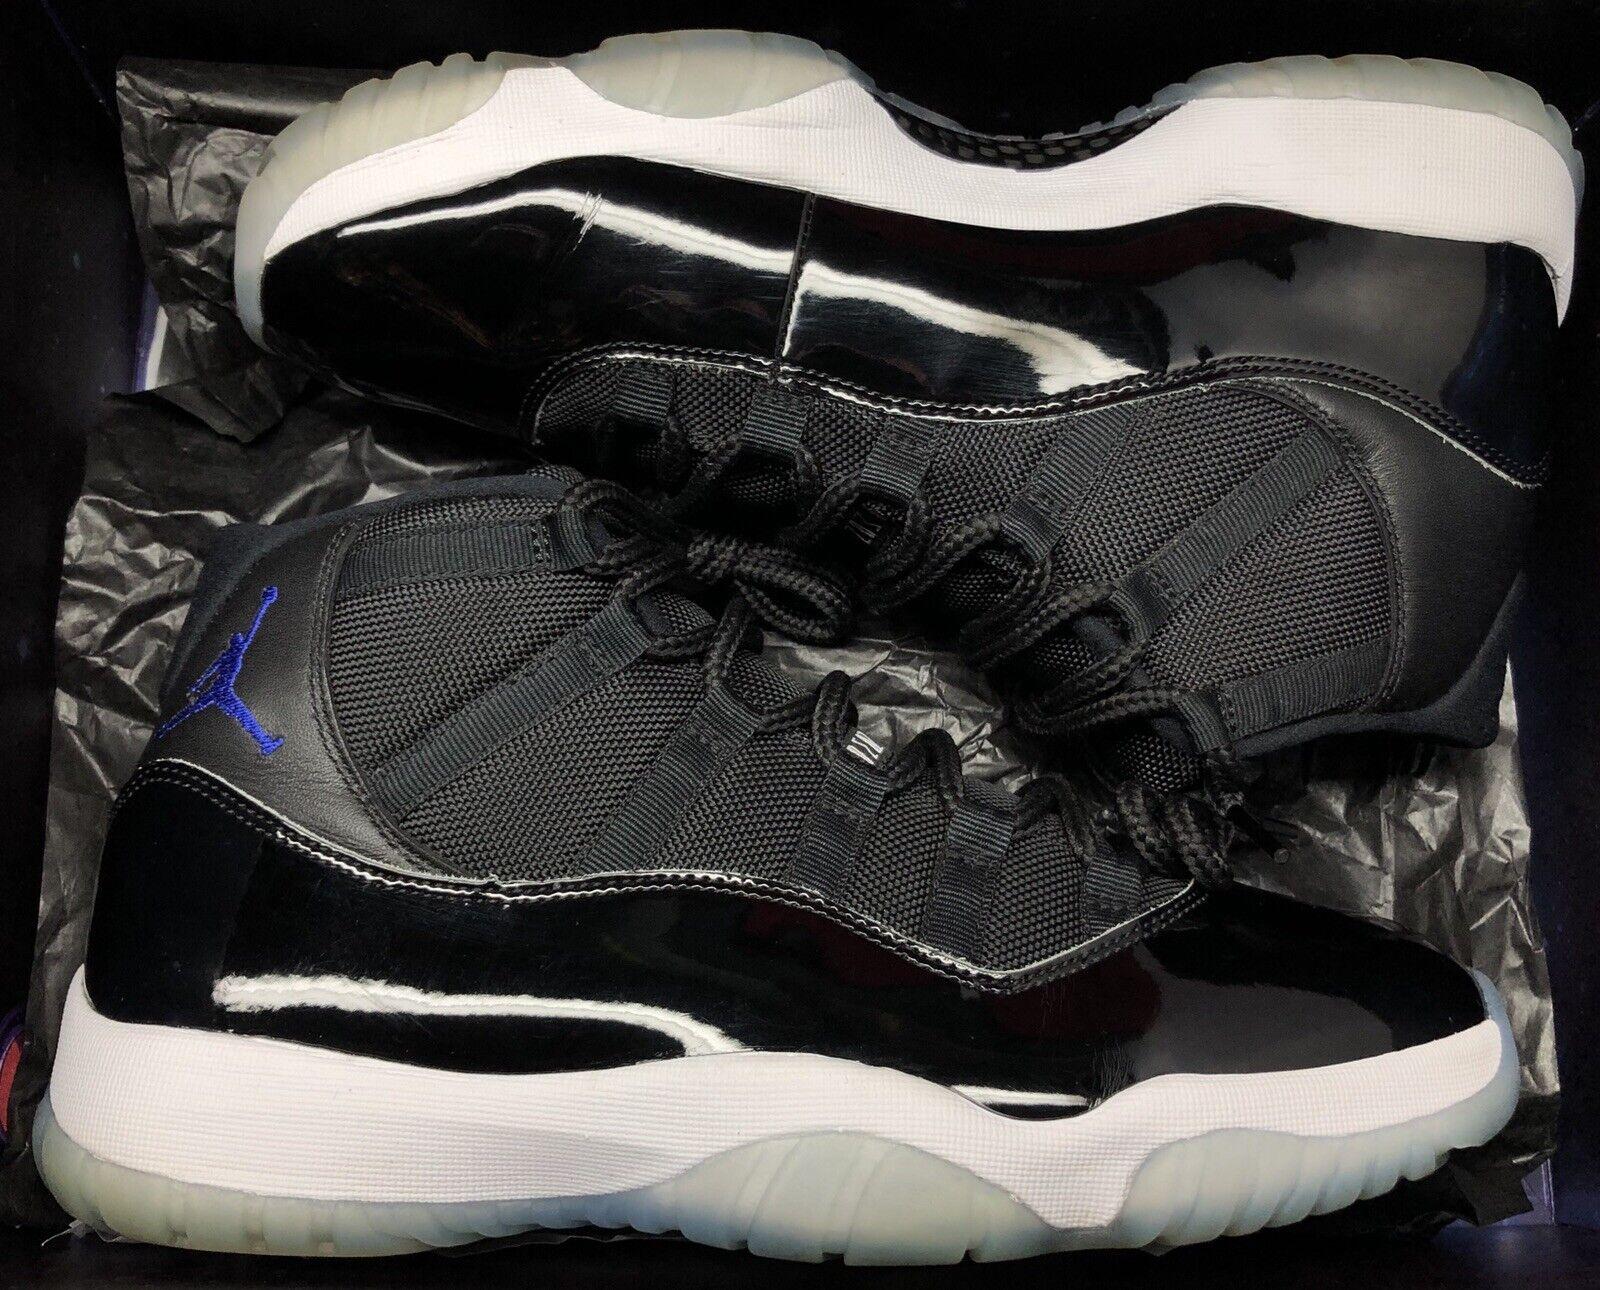 2016 Jordan 11 Space Jam Negro blancoo Concord criados Talla